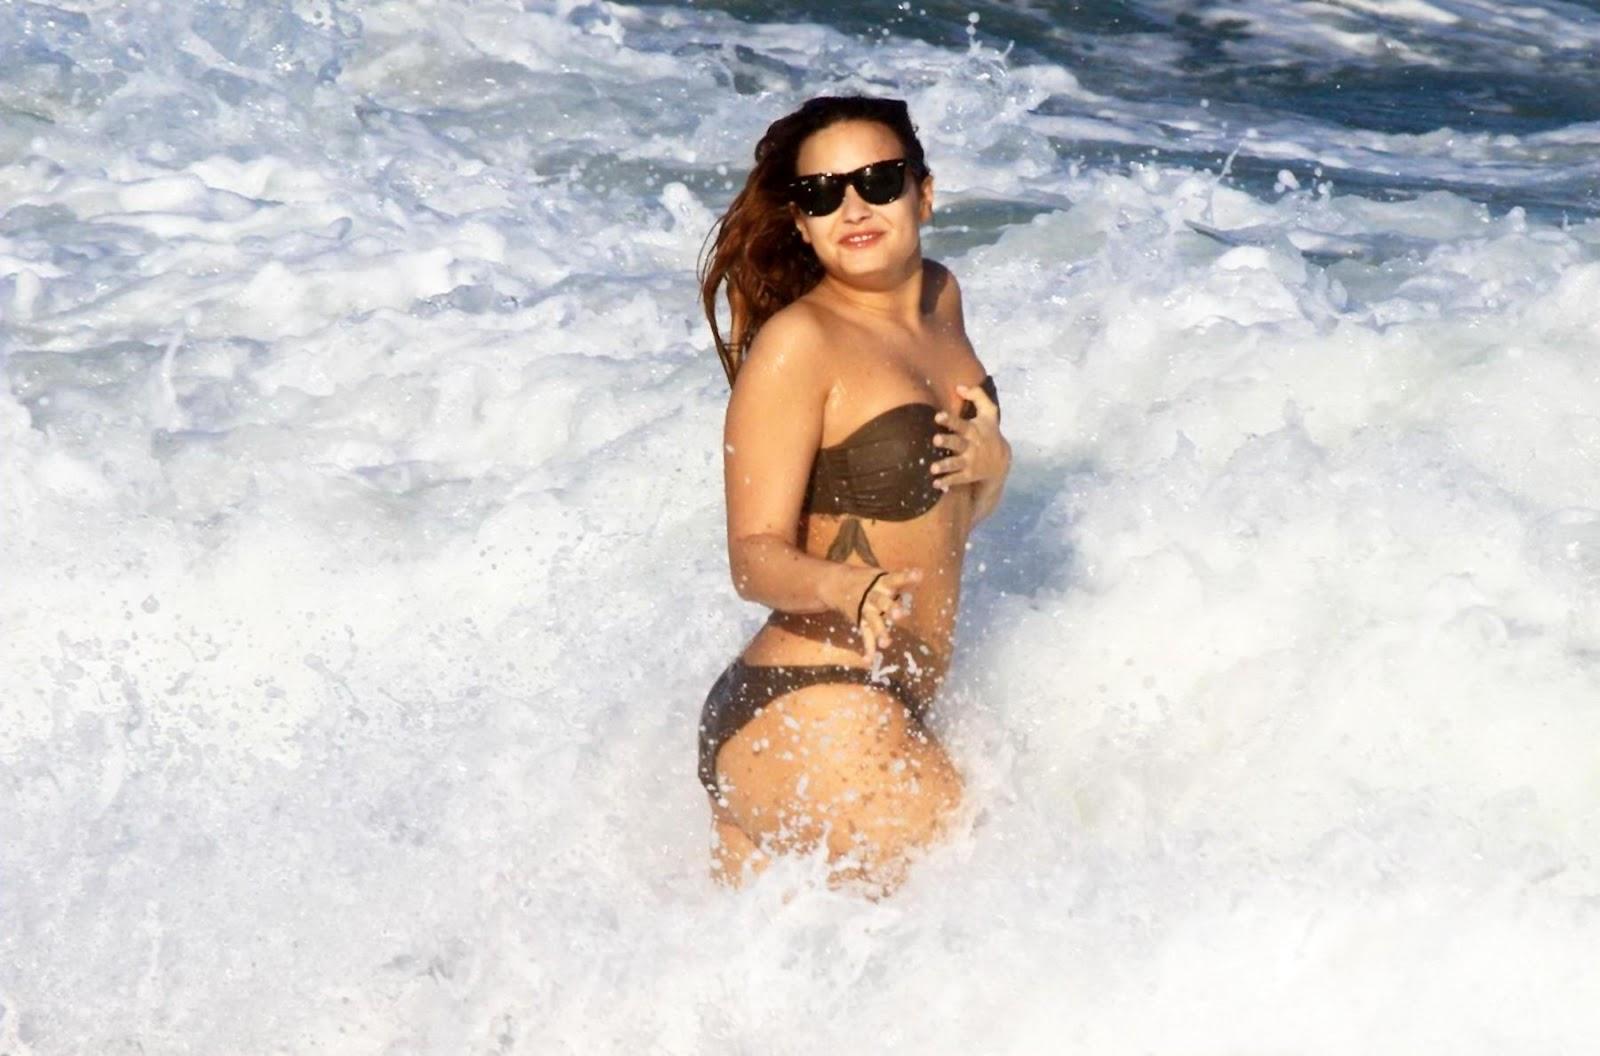 http://4.bp.blogspot.com/-EJN29tpaup4/T5WjTePszlI/AAAAAAAAEUg/T6V0GLWoMvk/s1600/Demi-Lovato-4.jpg